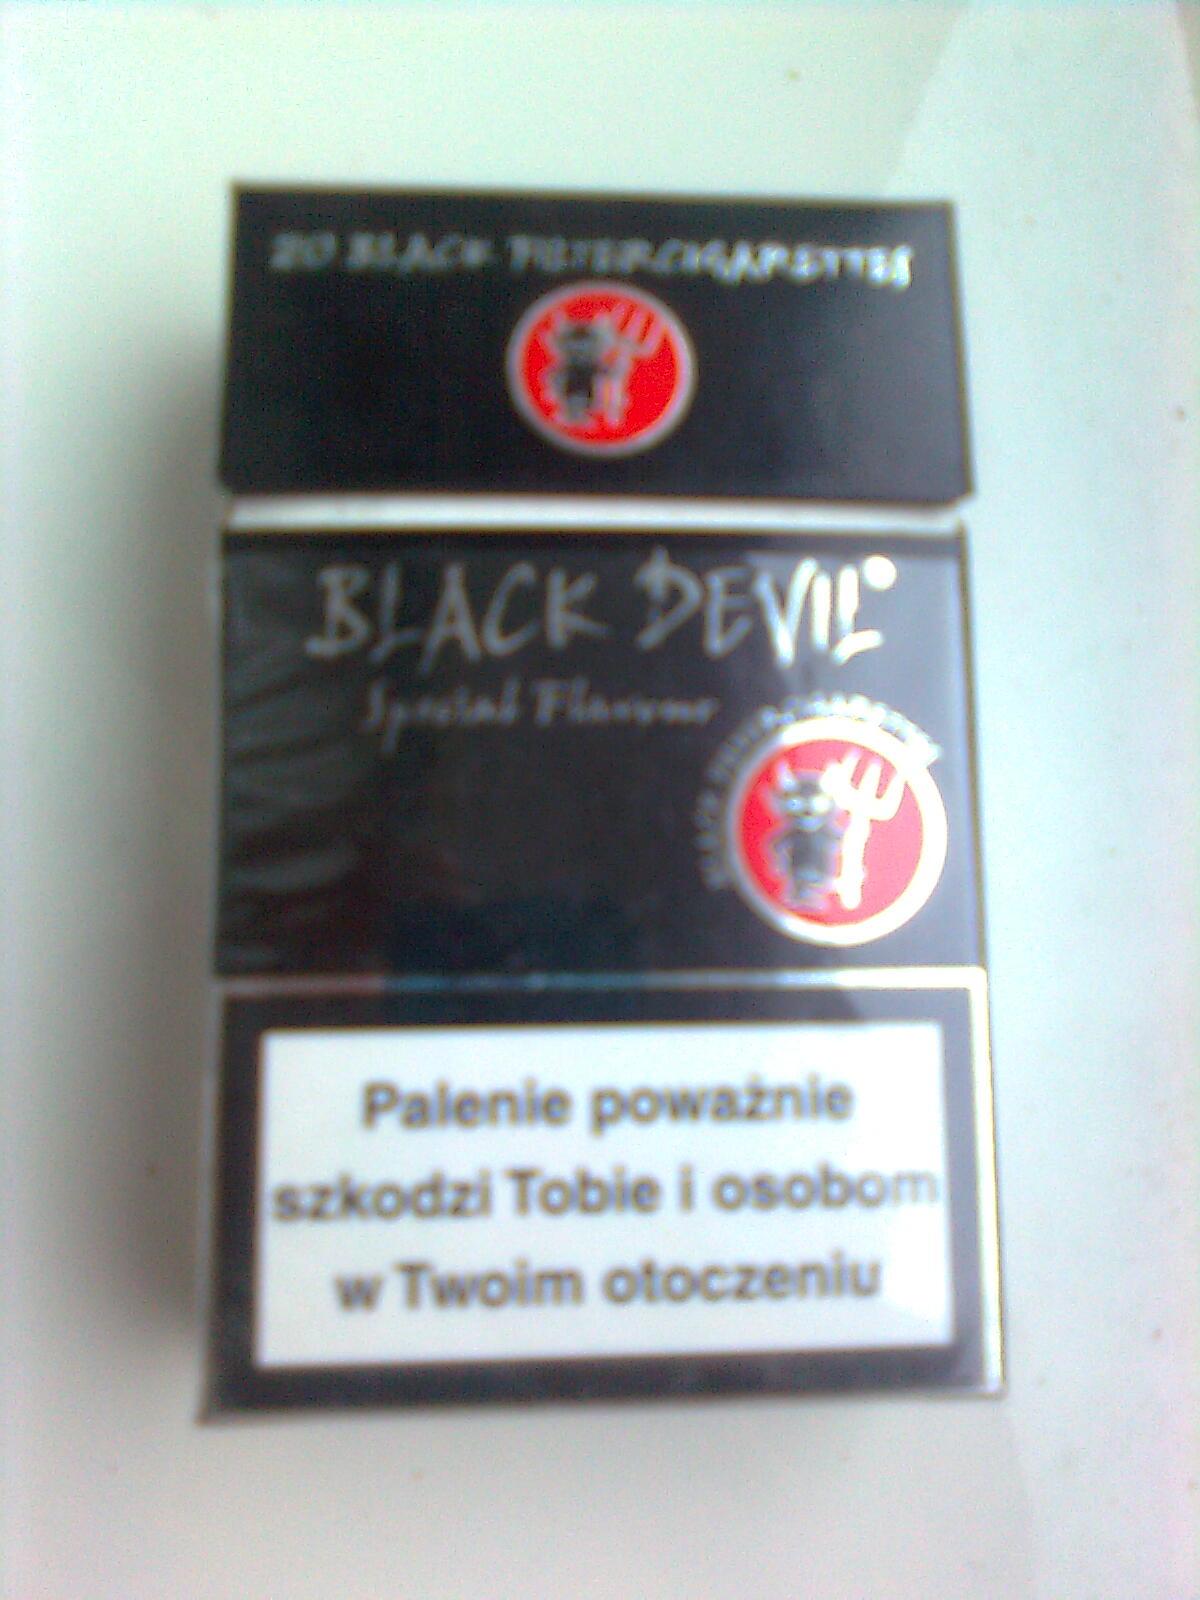 File:Black Devil - Special Flavour.jpg - Wikimedia Commons